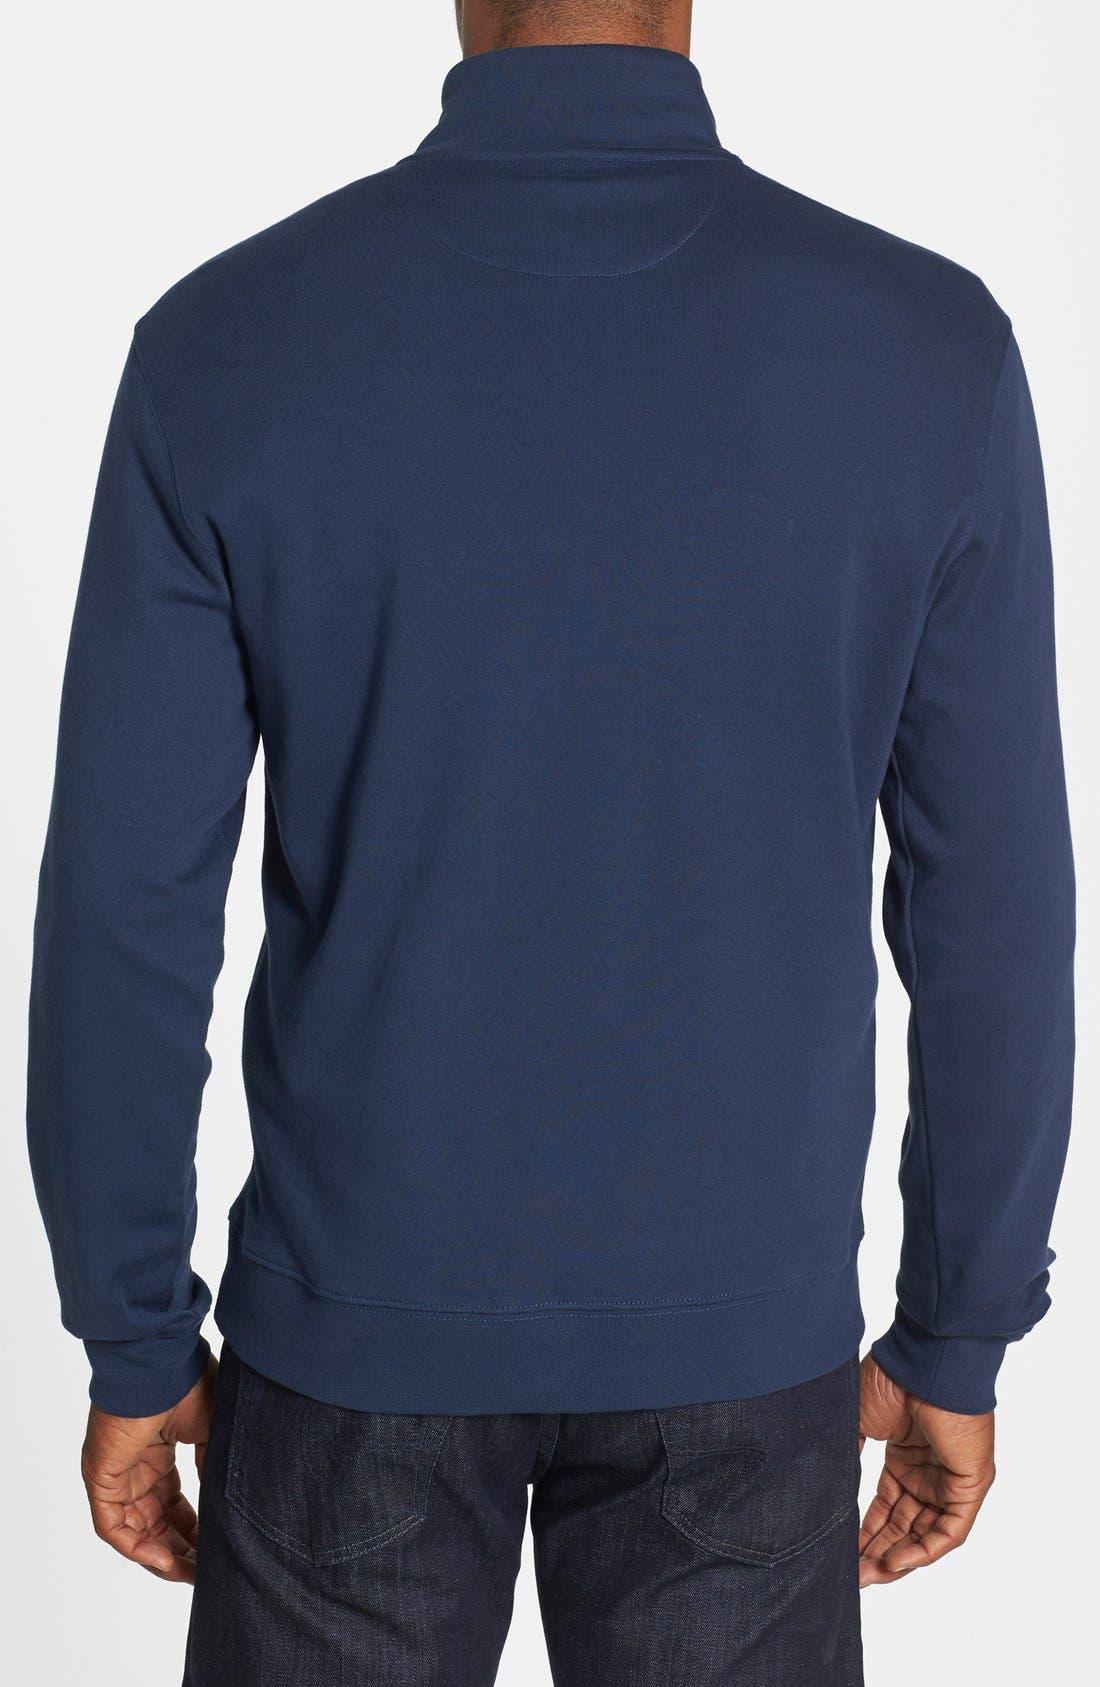 Alternate Image 2  - Vineyard Vines Quarter Zip Cotton Jersey Sweatshirt